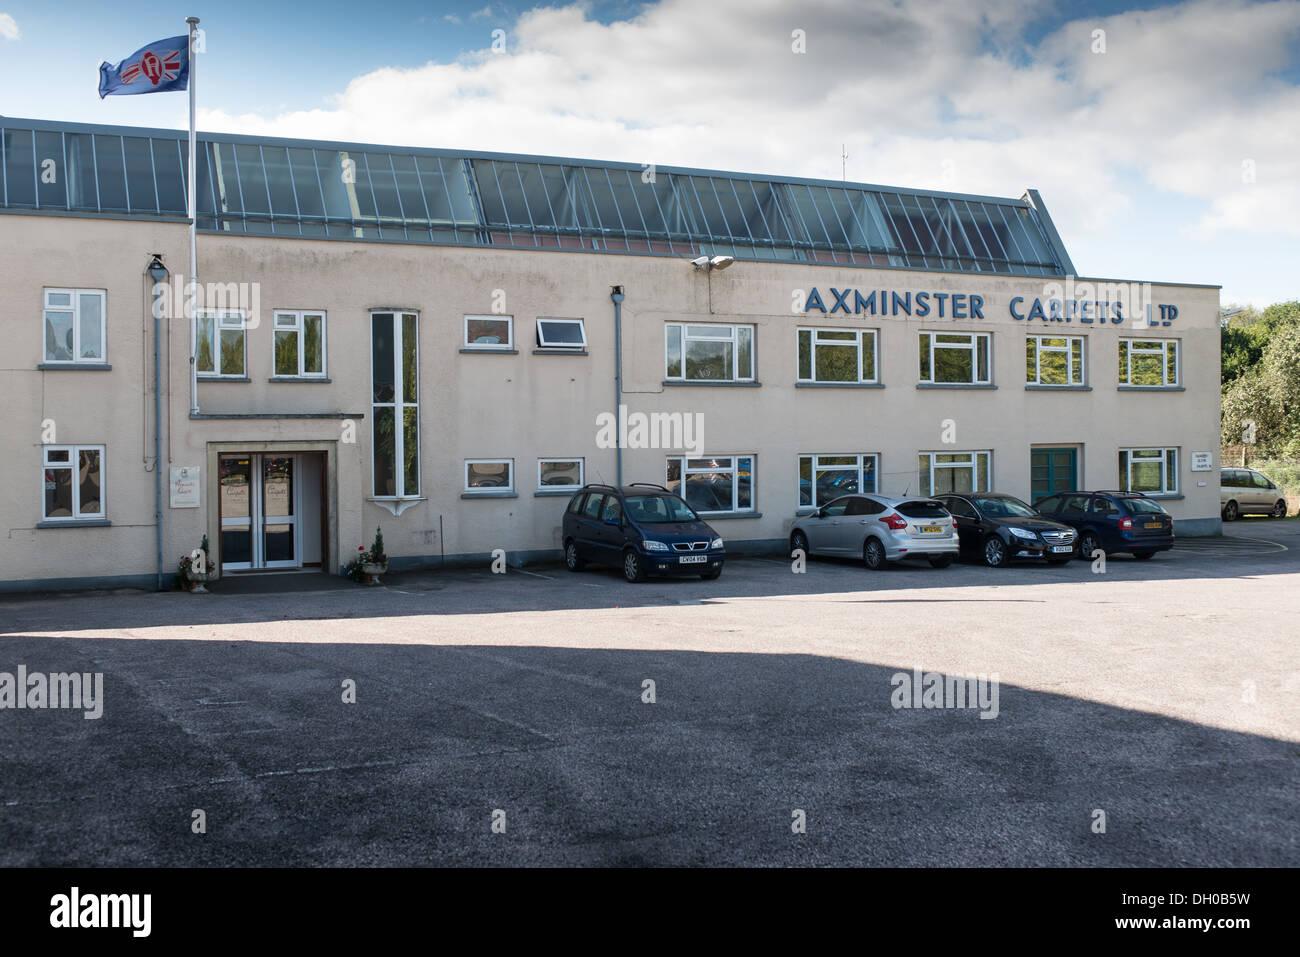 Axminster carpets factory in Devon - Stock Image